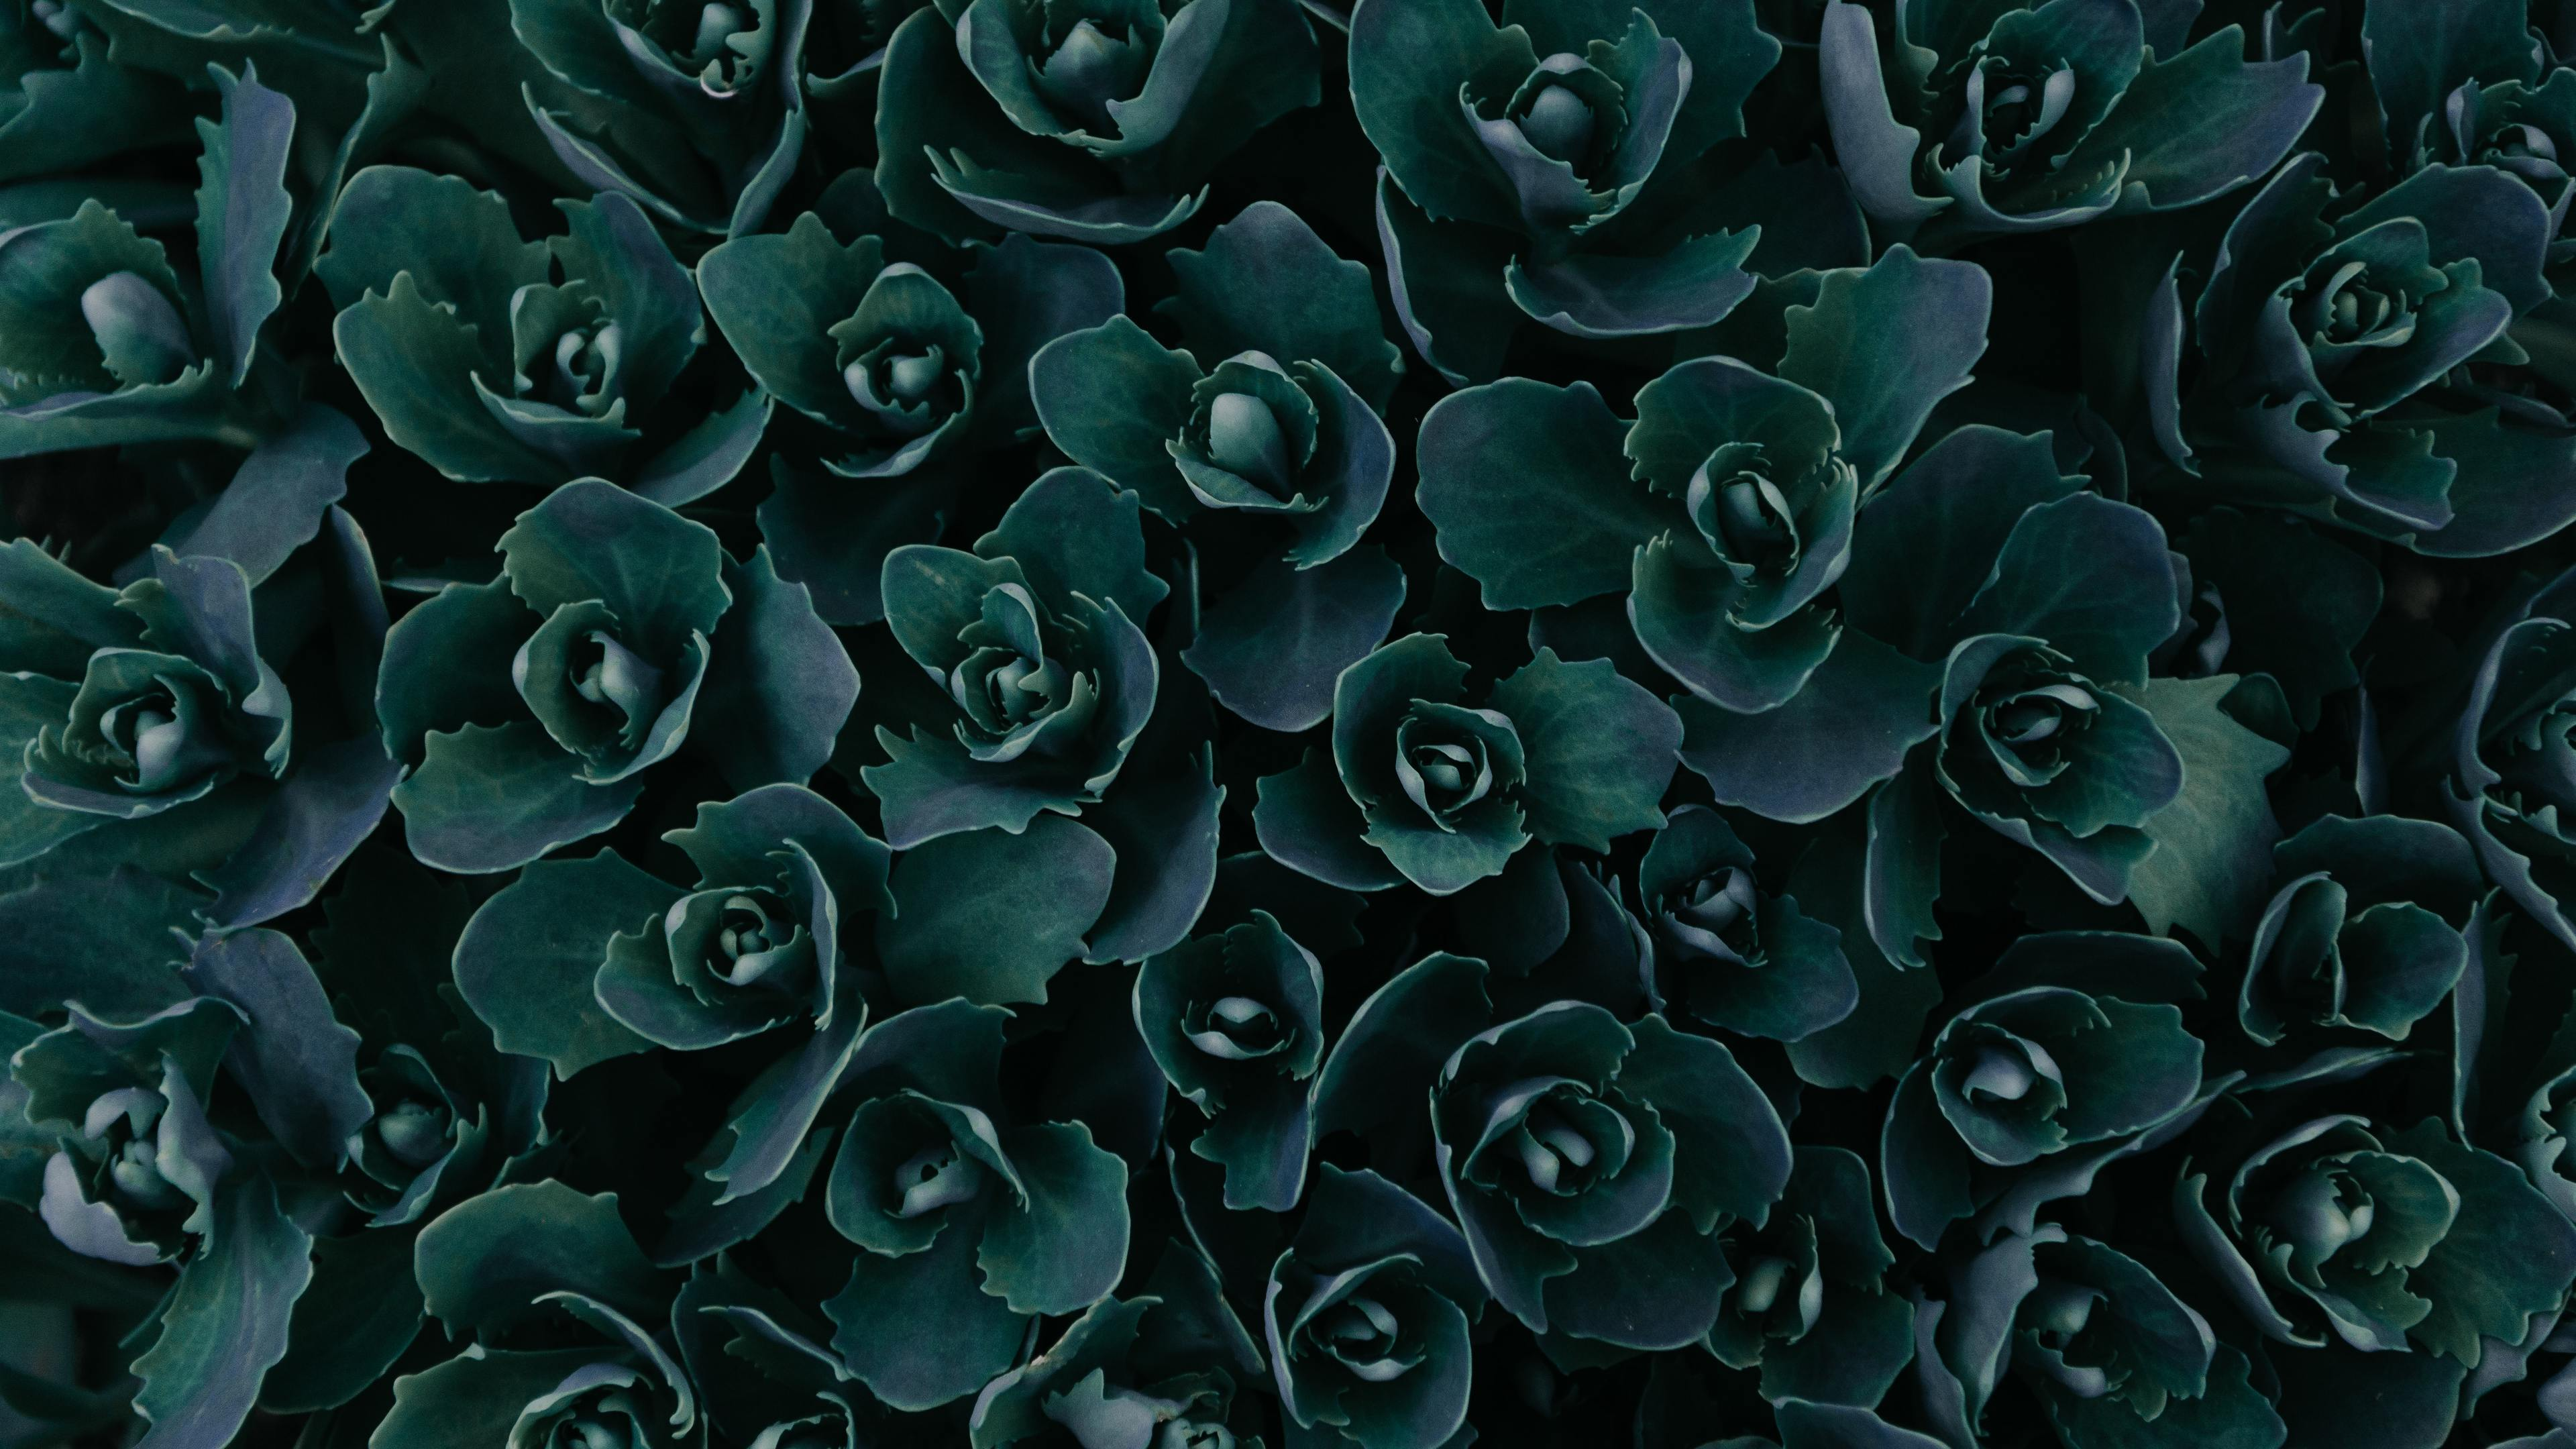 dark green plants abstract 5k 1540141555 - Dark Green Plants Abstract 5k - plants wallpapers, photography wallpapers, nature wallpapers, hd-wallpapers, green wallpapers, abstract wallpapers, 5k wallpapers, 4k-wallpapers